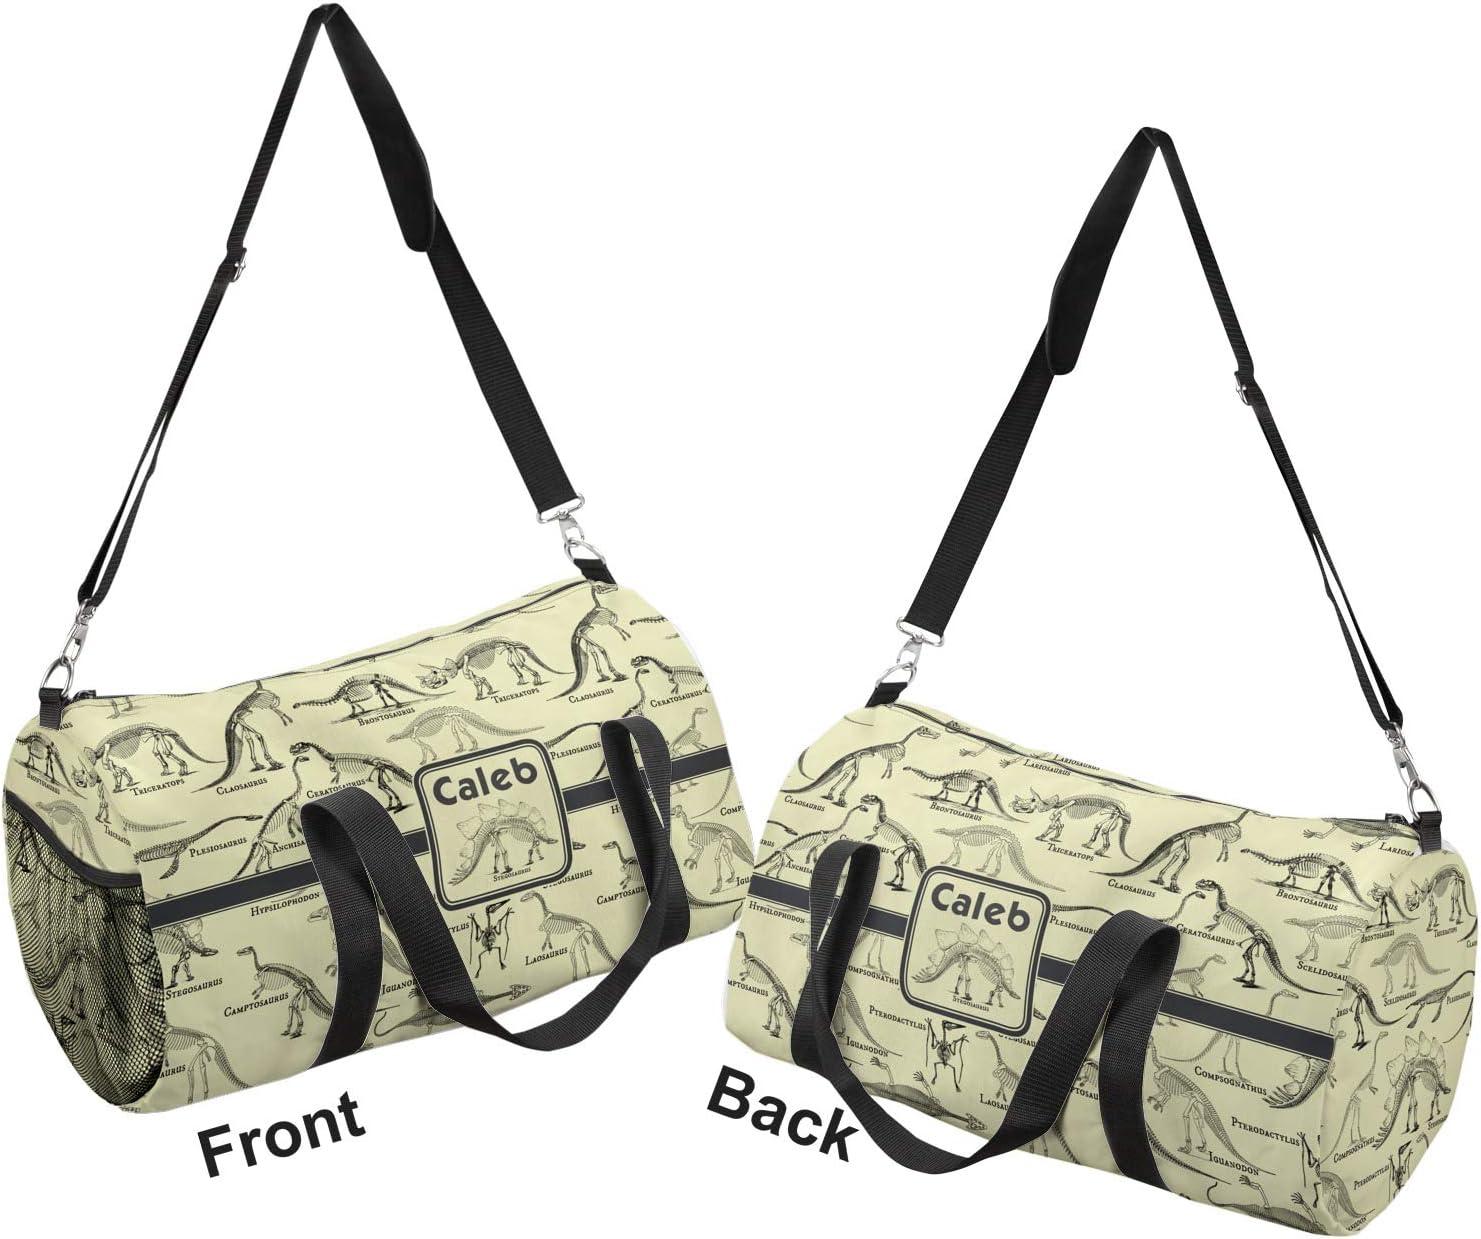 YouCustomizeIt Dinosaur Skeletons Duffel Bag Personalized